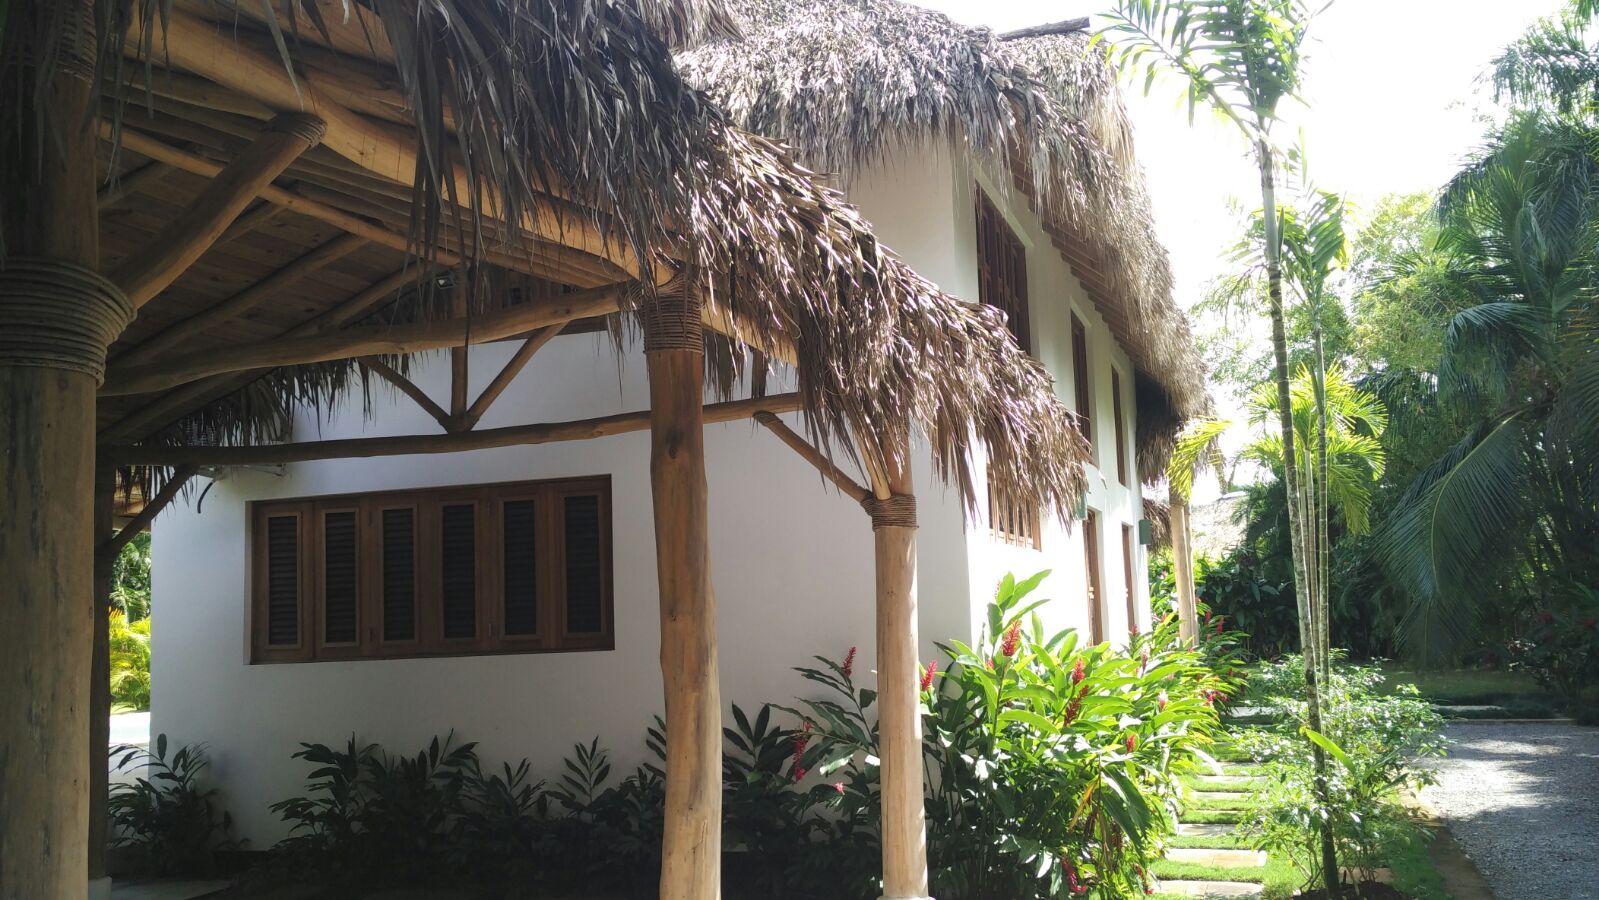 Villa for rent Las Terrenas Cote ci cote la7.jpeg